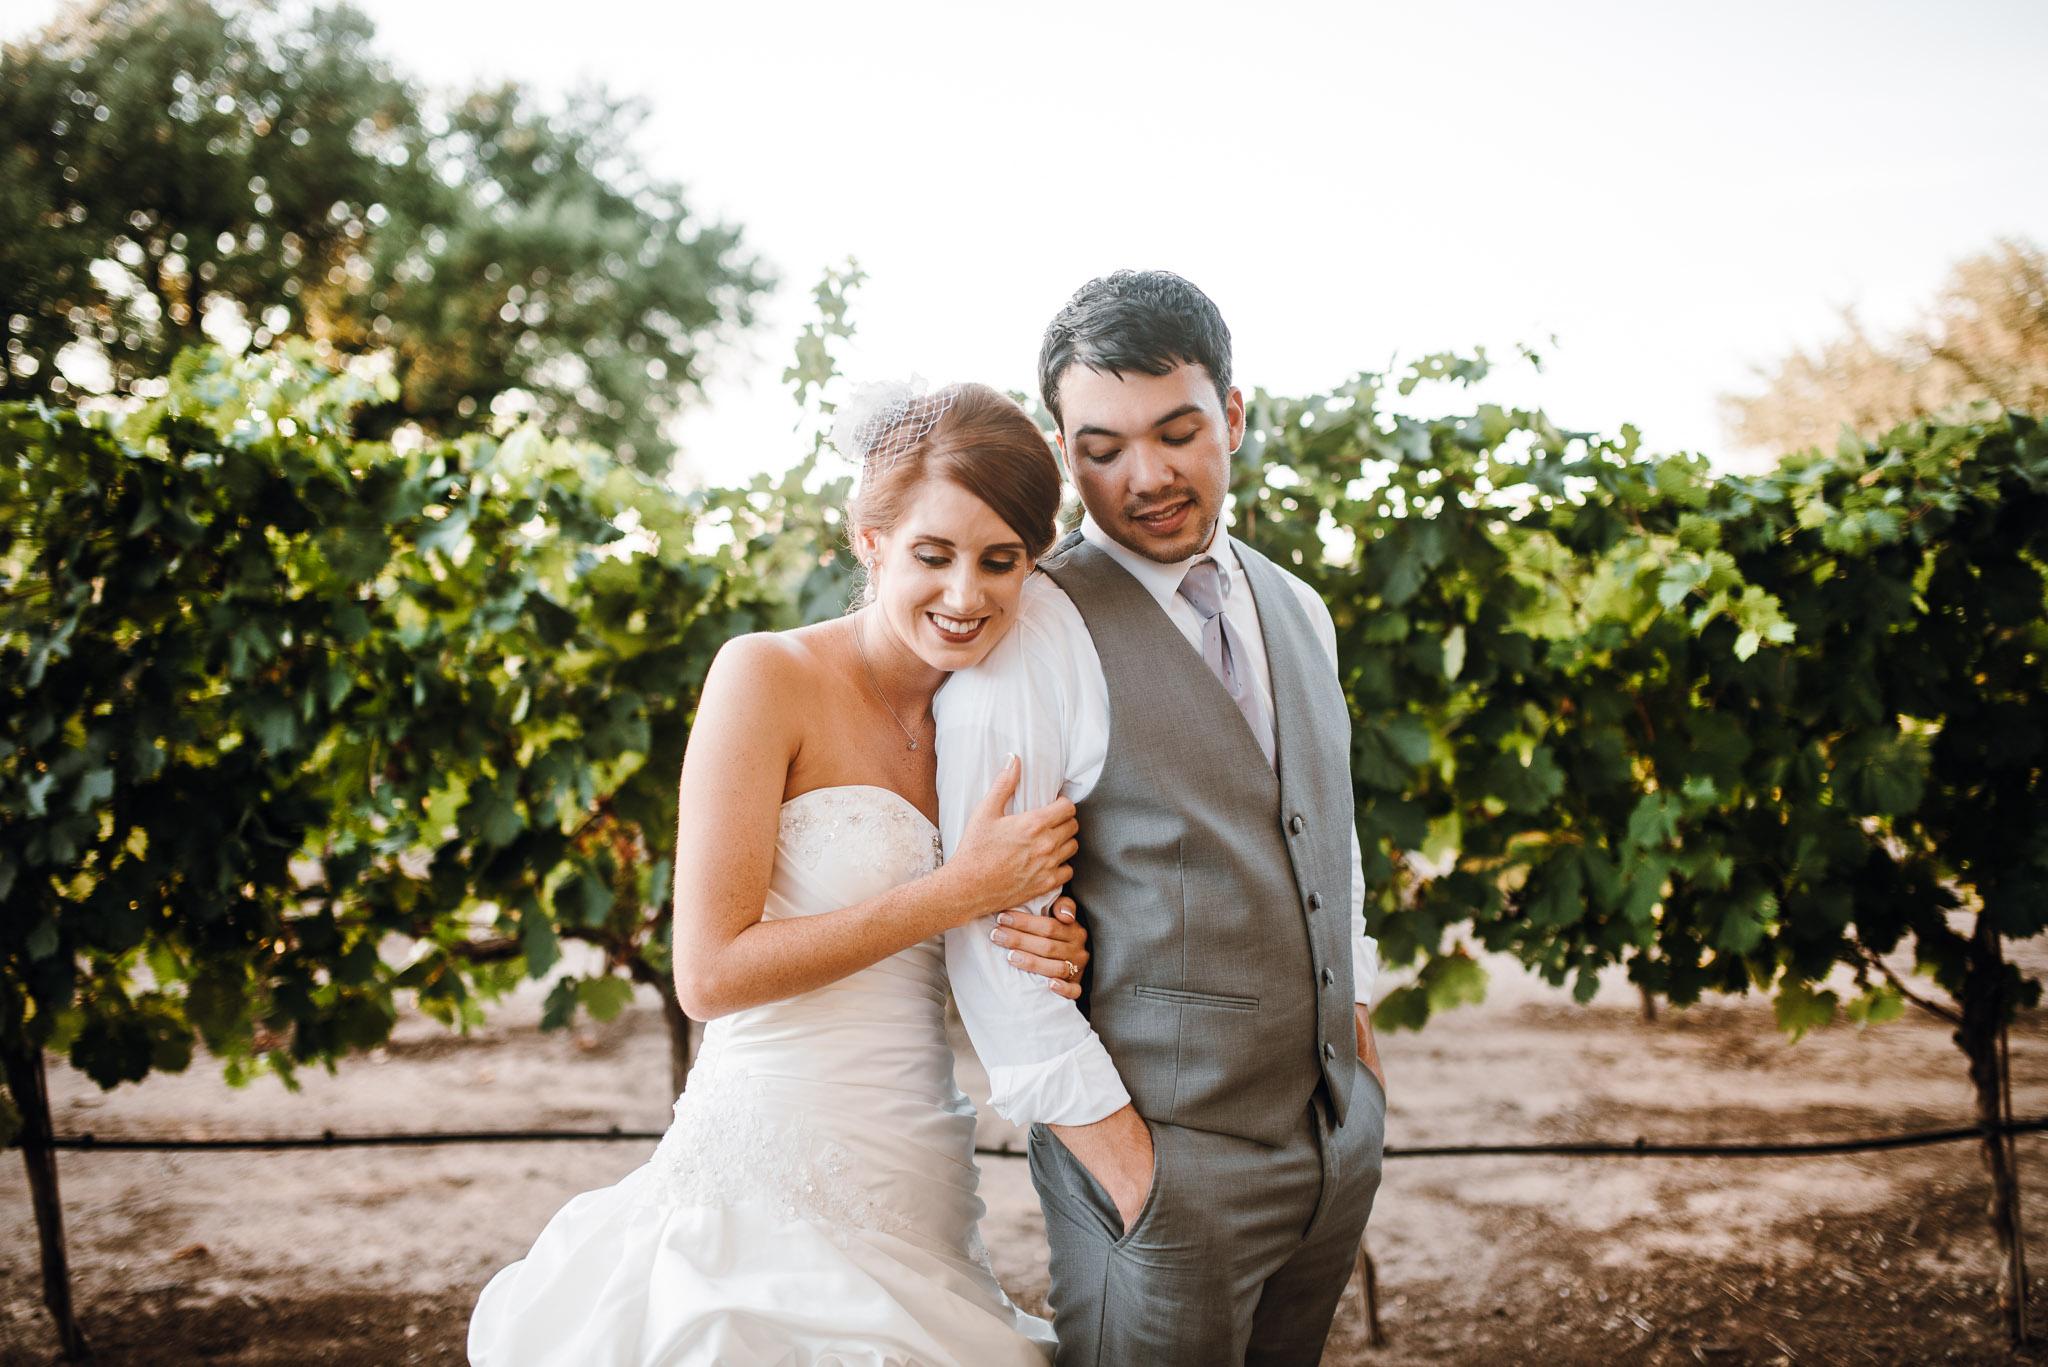 Chapel-In-The-Vineyard-Christoval-Vineyards-and-Winery-Wedding_Kayla&Eric-0059.jpg